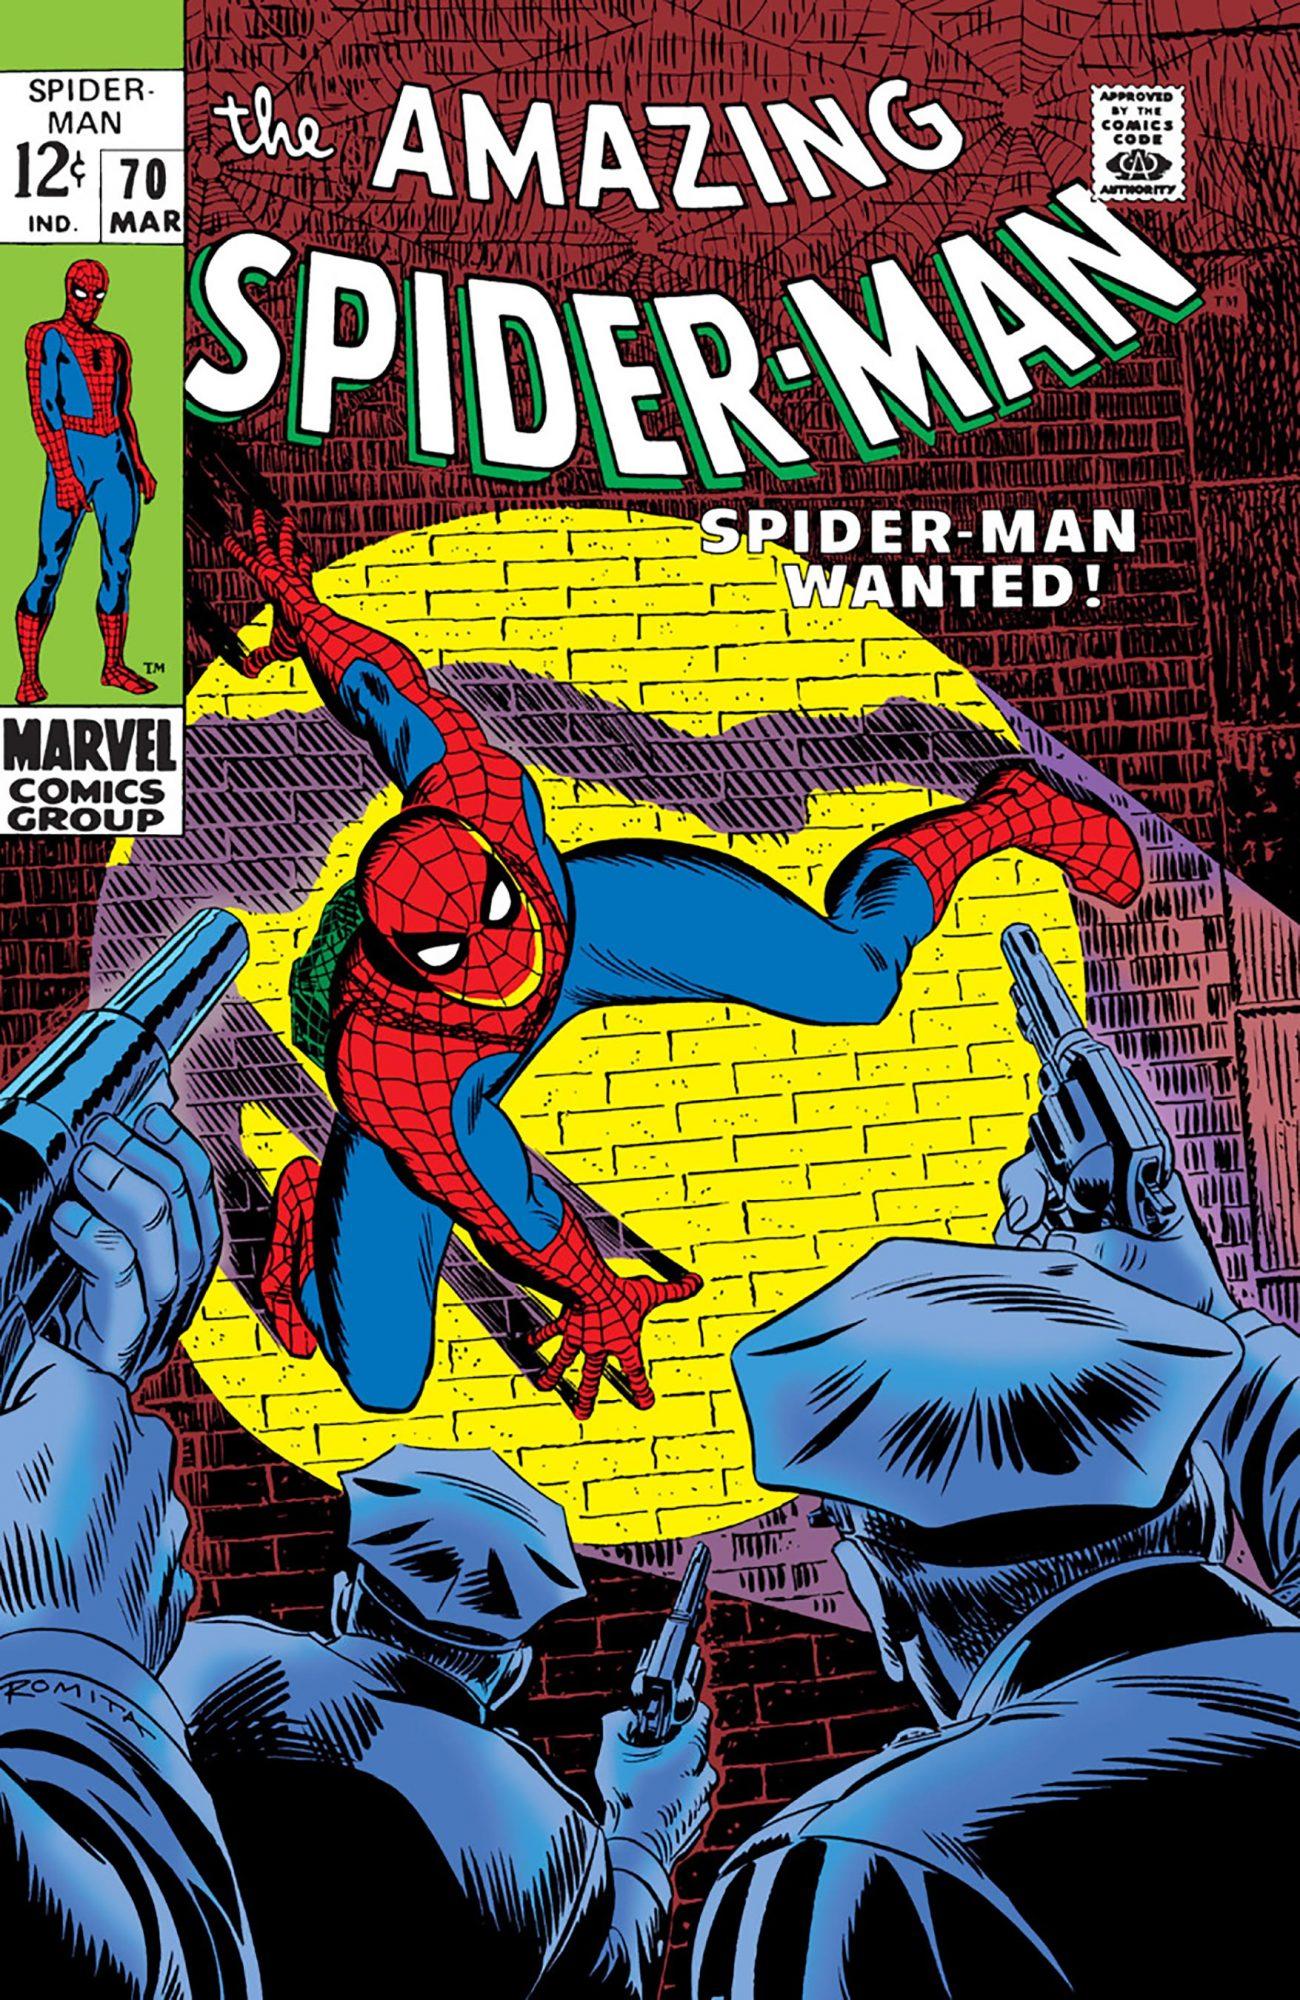 Amazing Spider-Man #70John Romita Sr., 1969